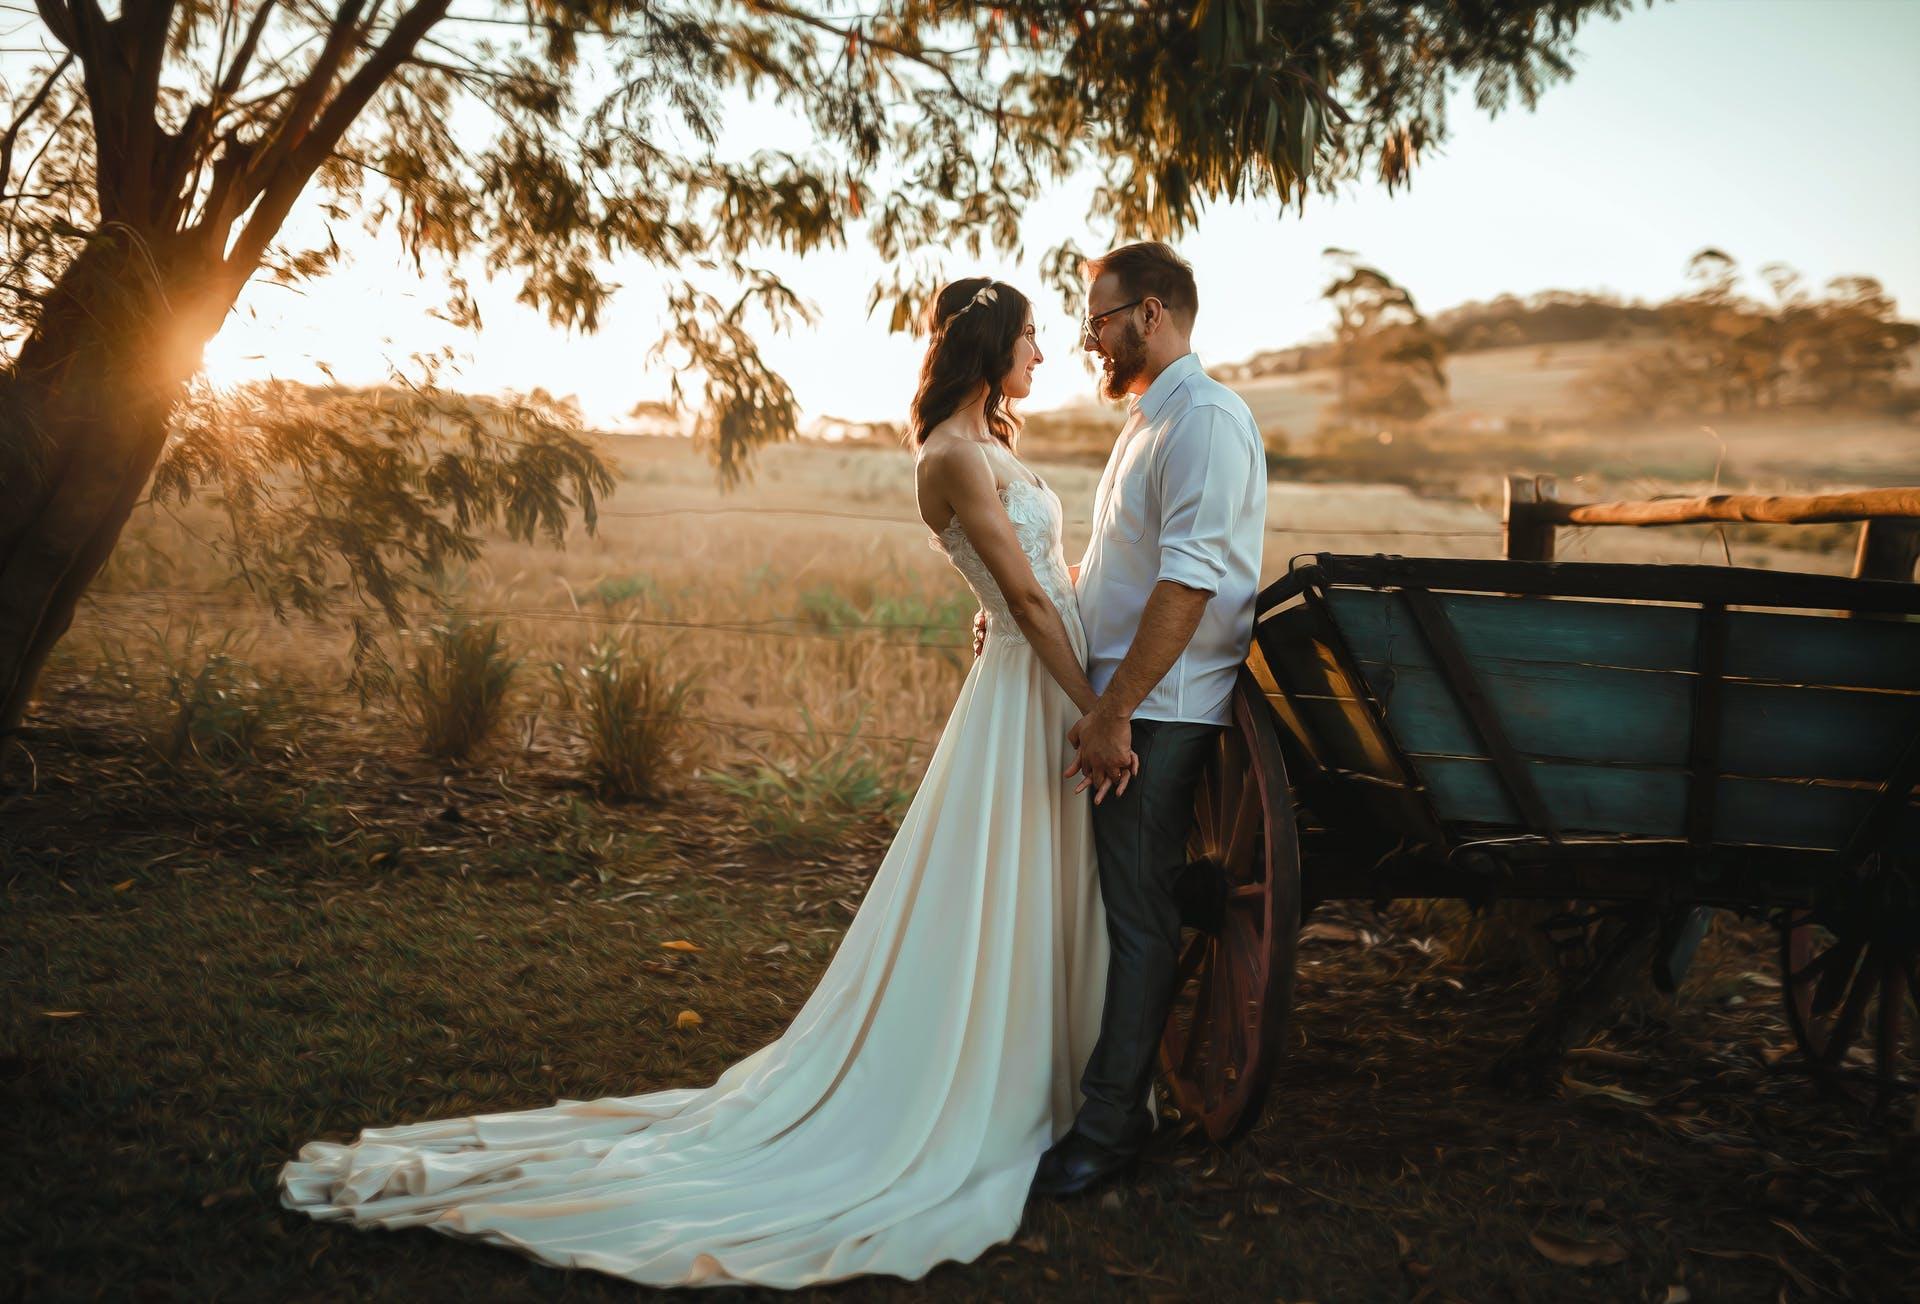 Wedding-Dresses-4096